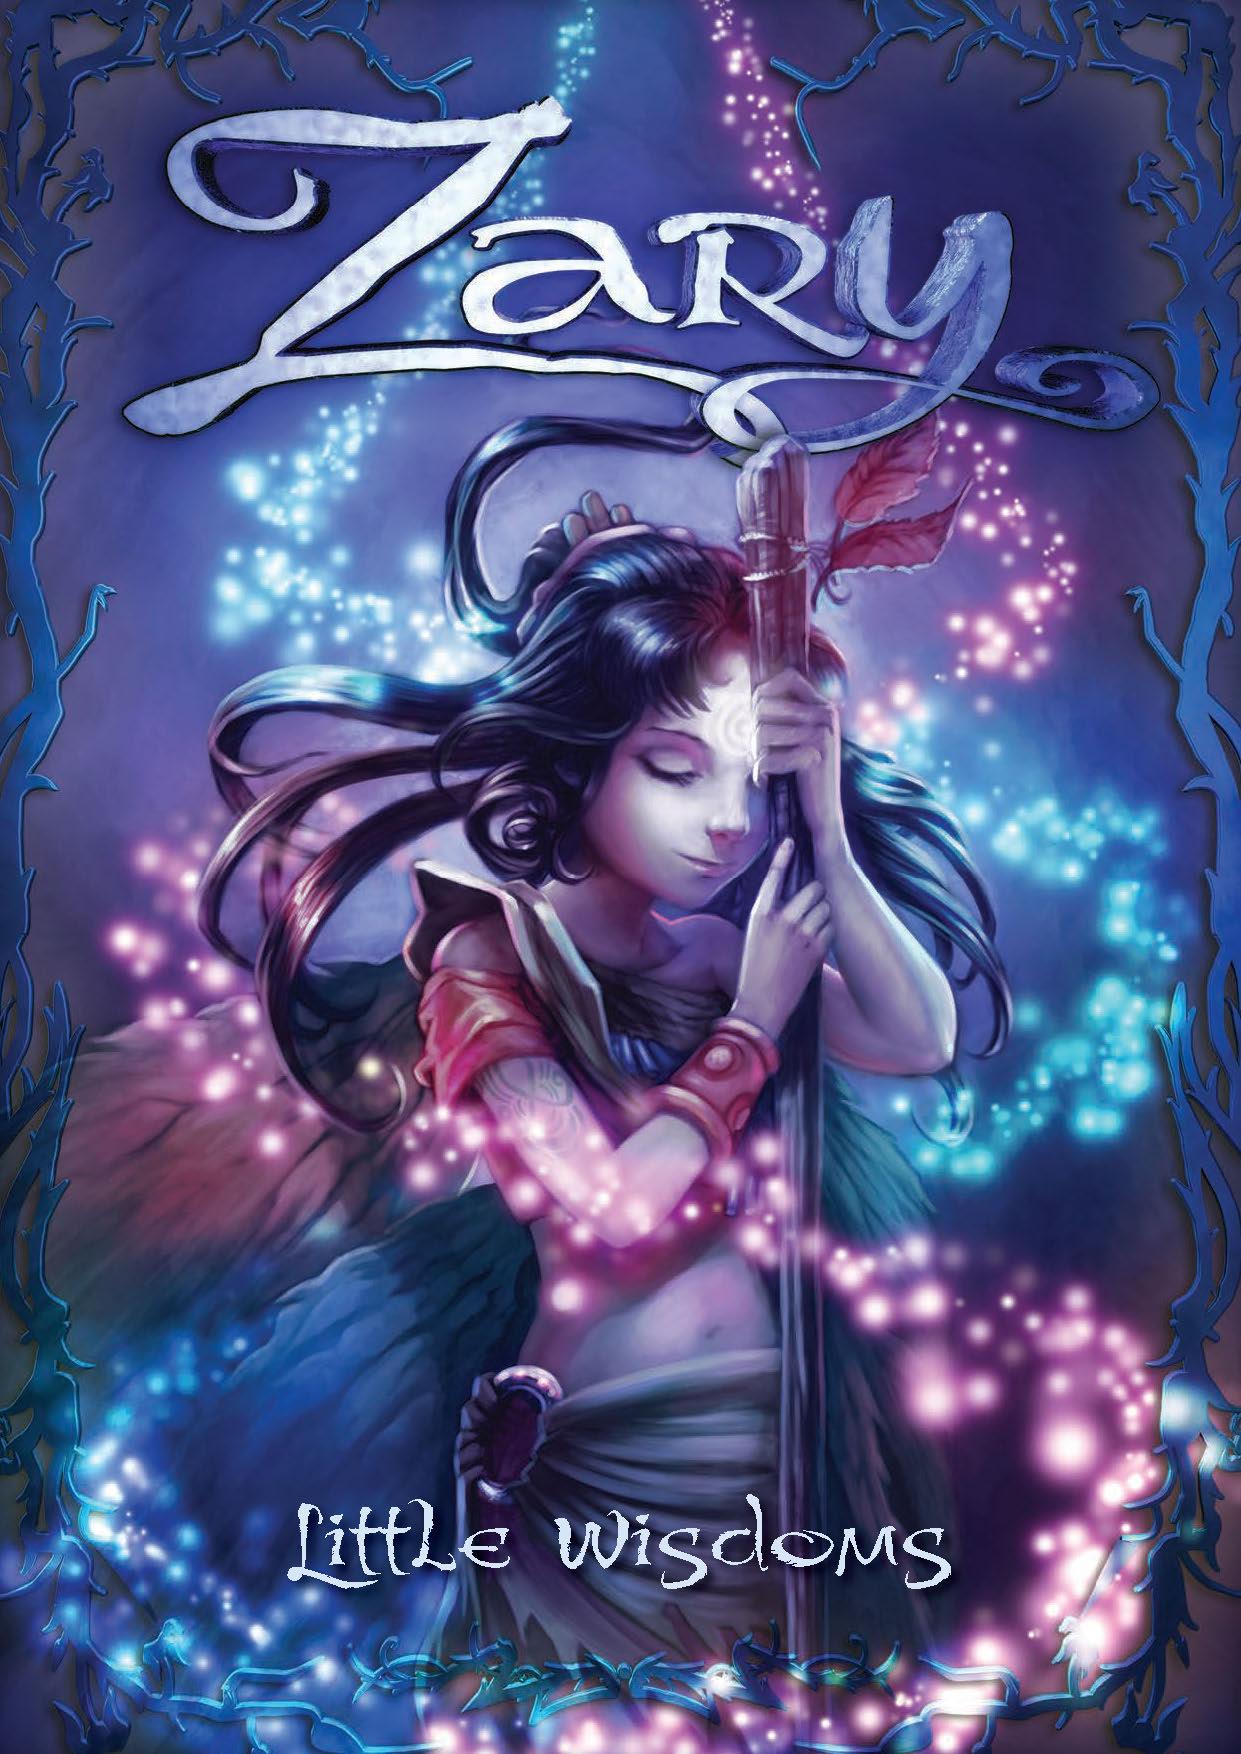 Zary Little Wisdoms - Book cover